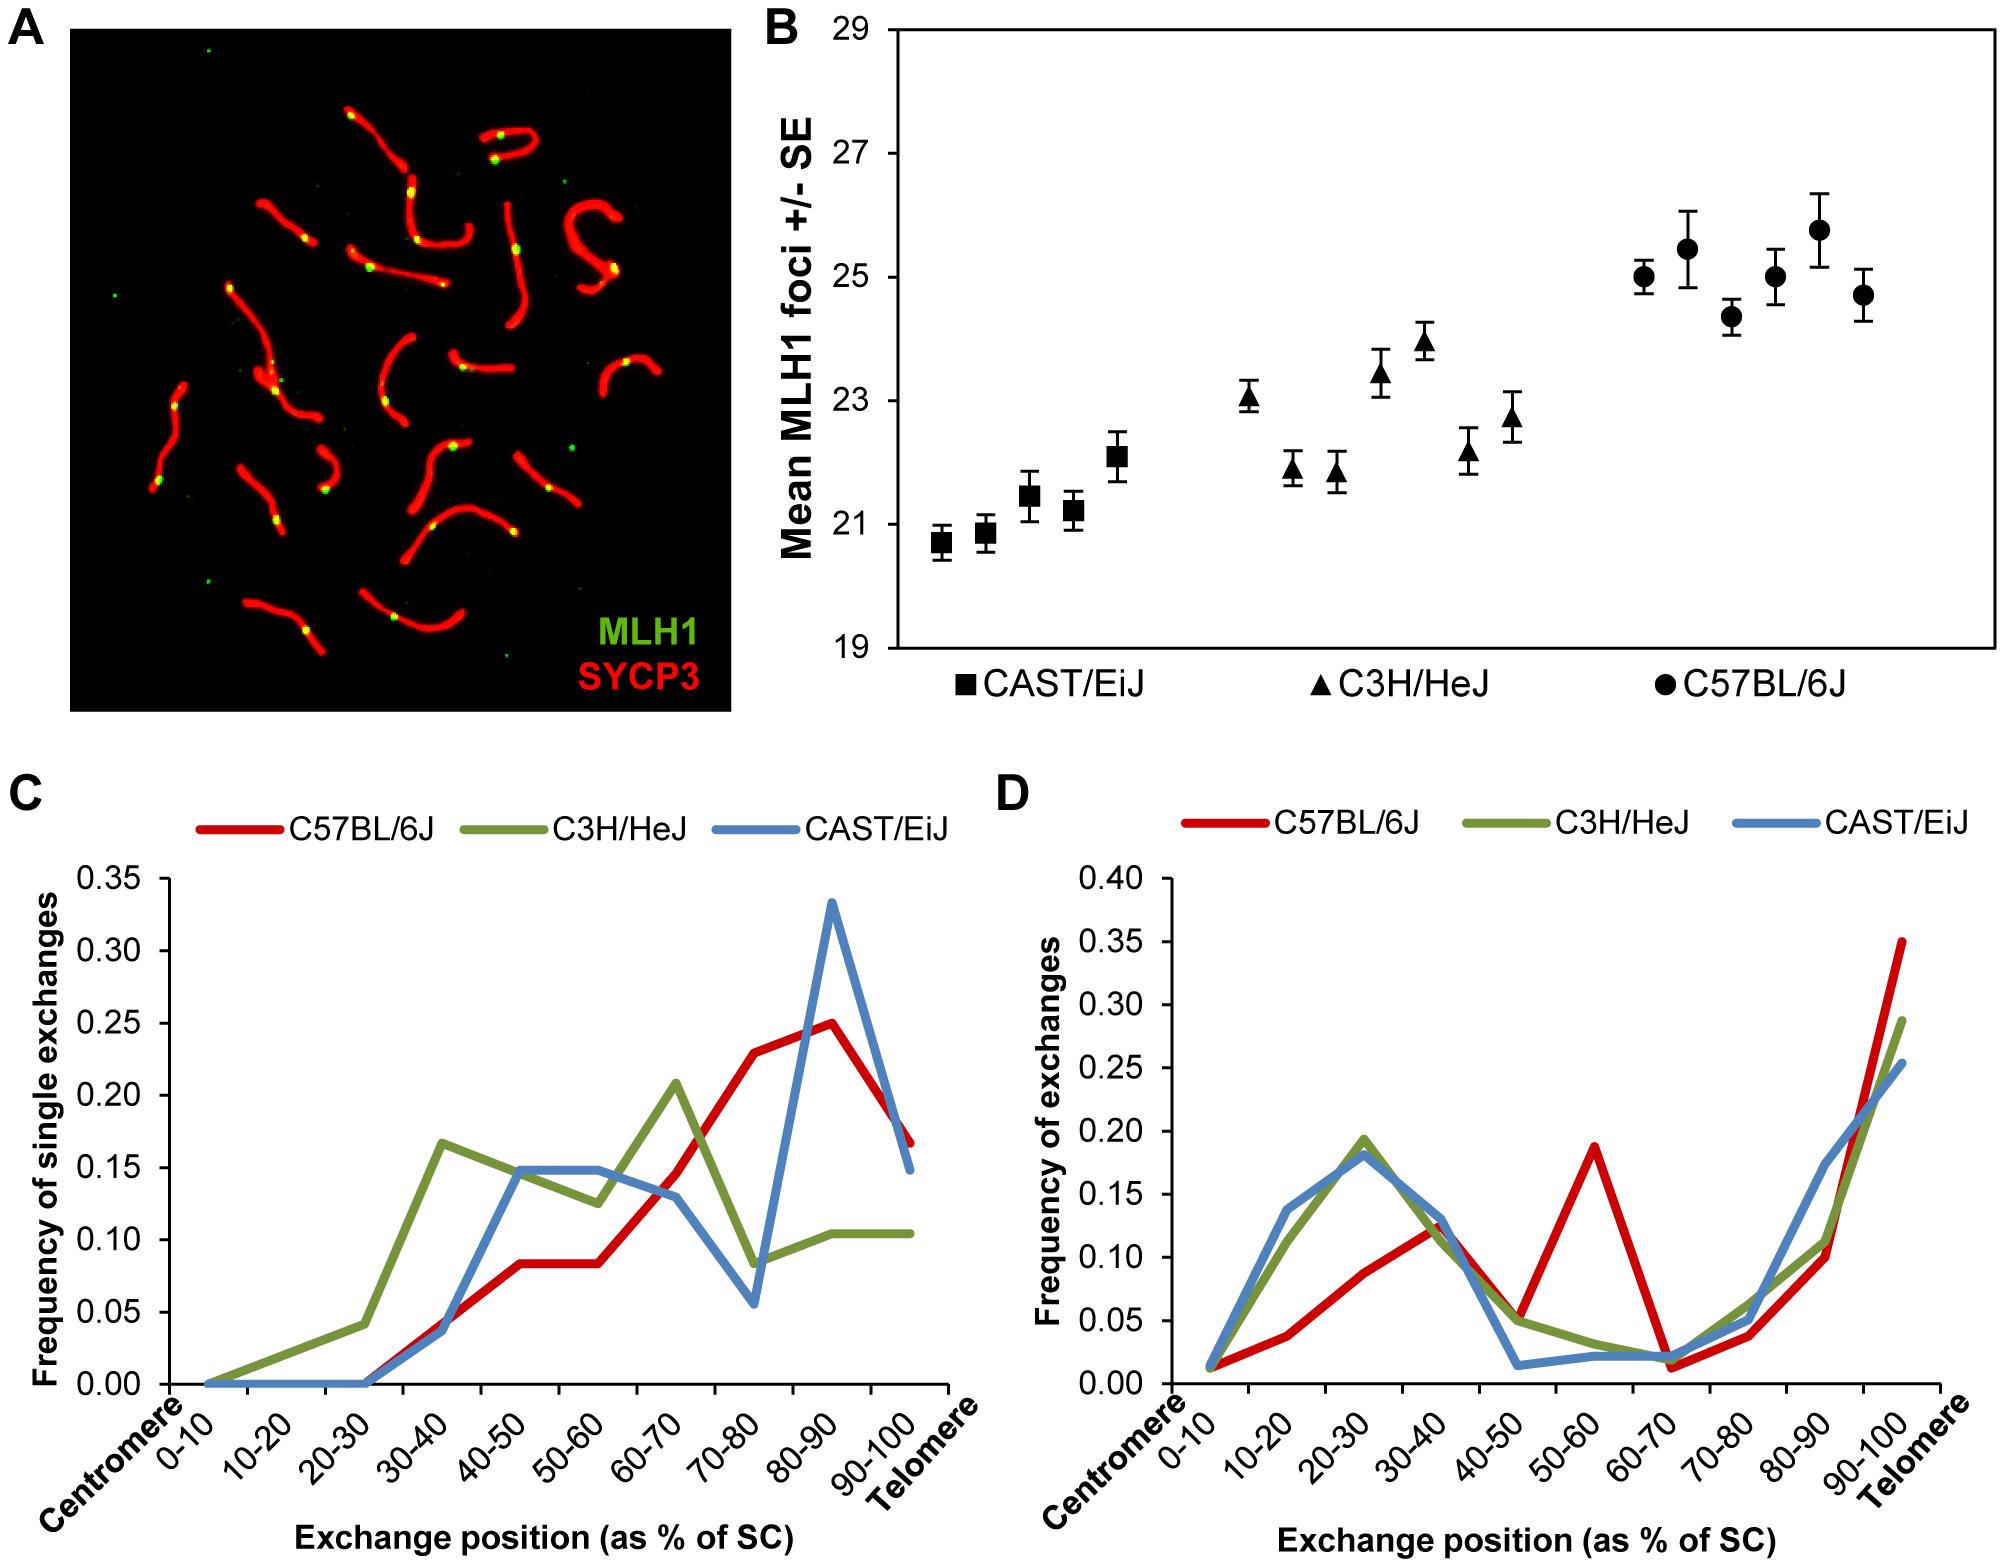 Inter-strain variation in mean MLH1 values.